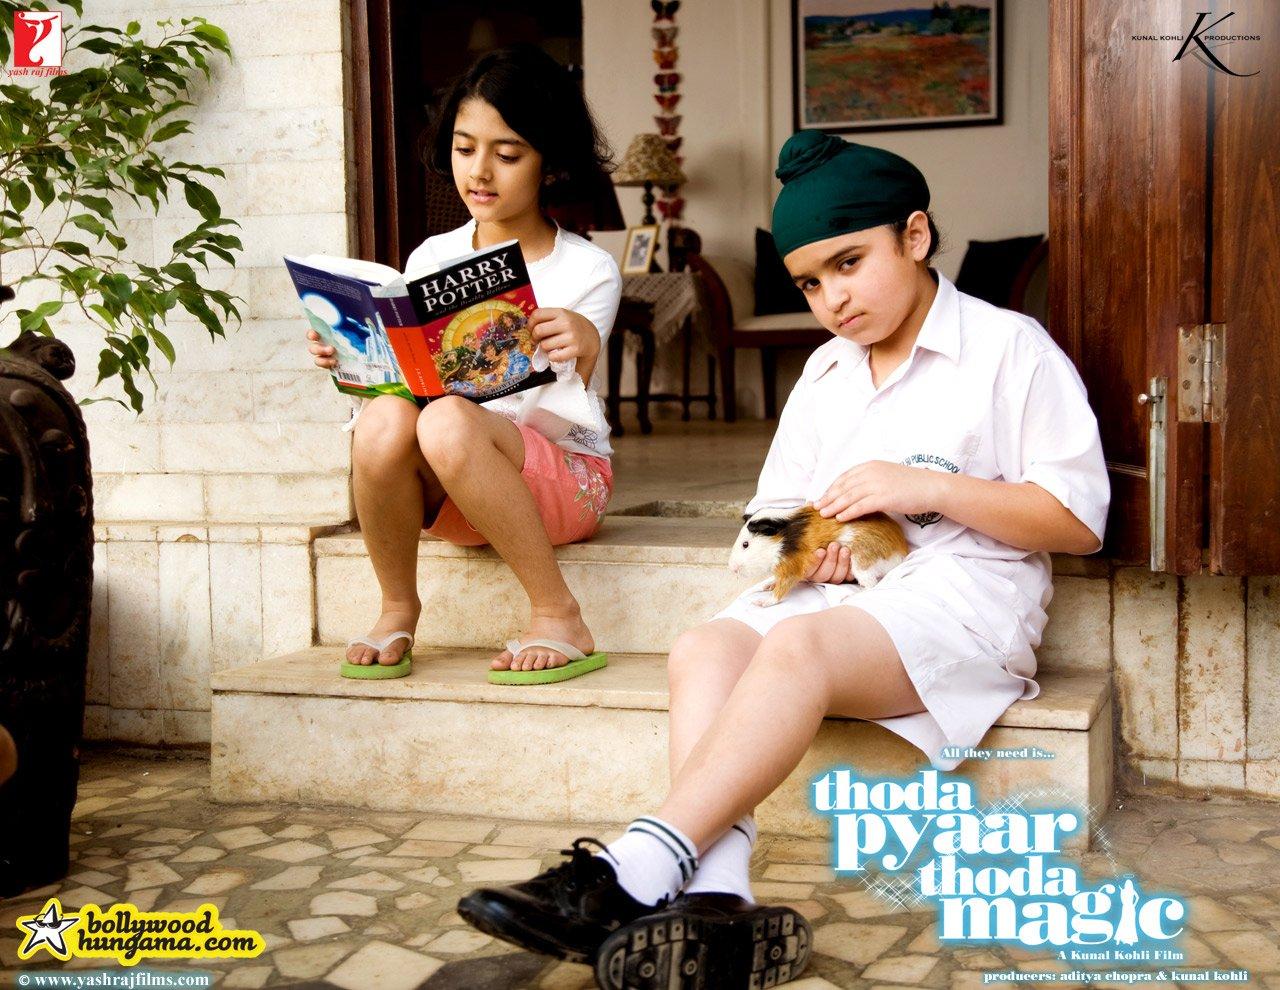 http://i.indiafm.com/posters/movies/08/thodapyaarthodamagic/still15.jpg